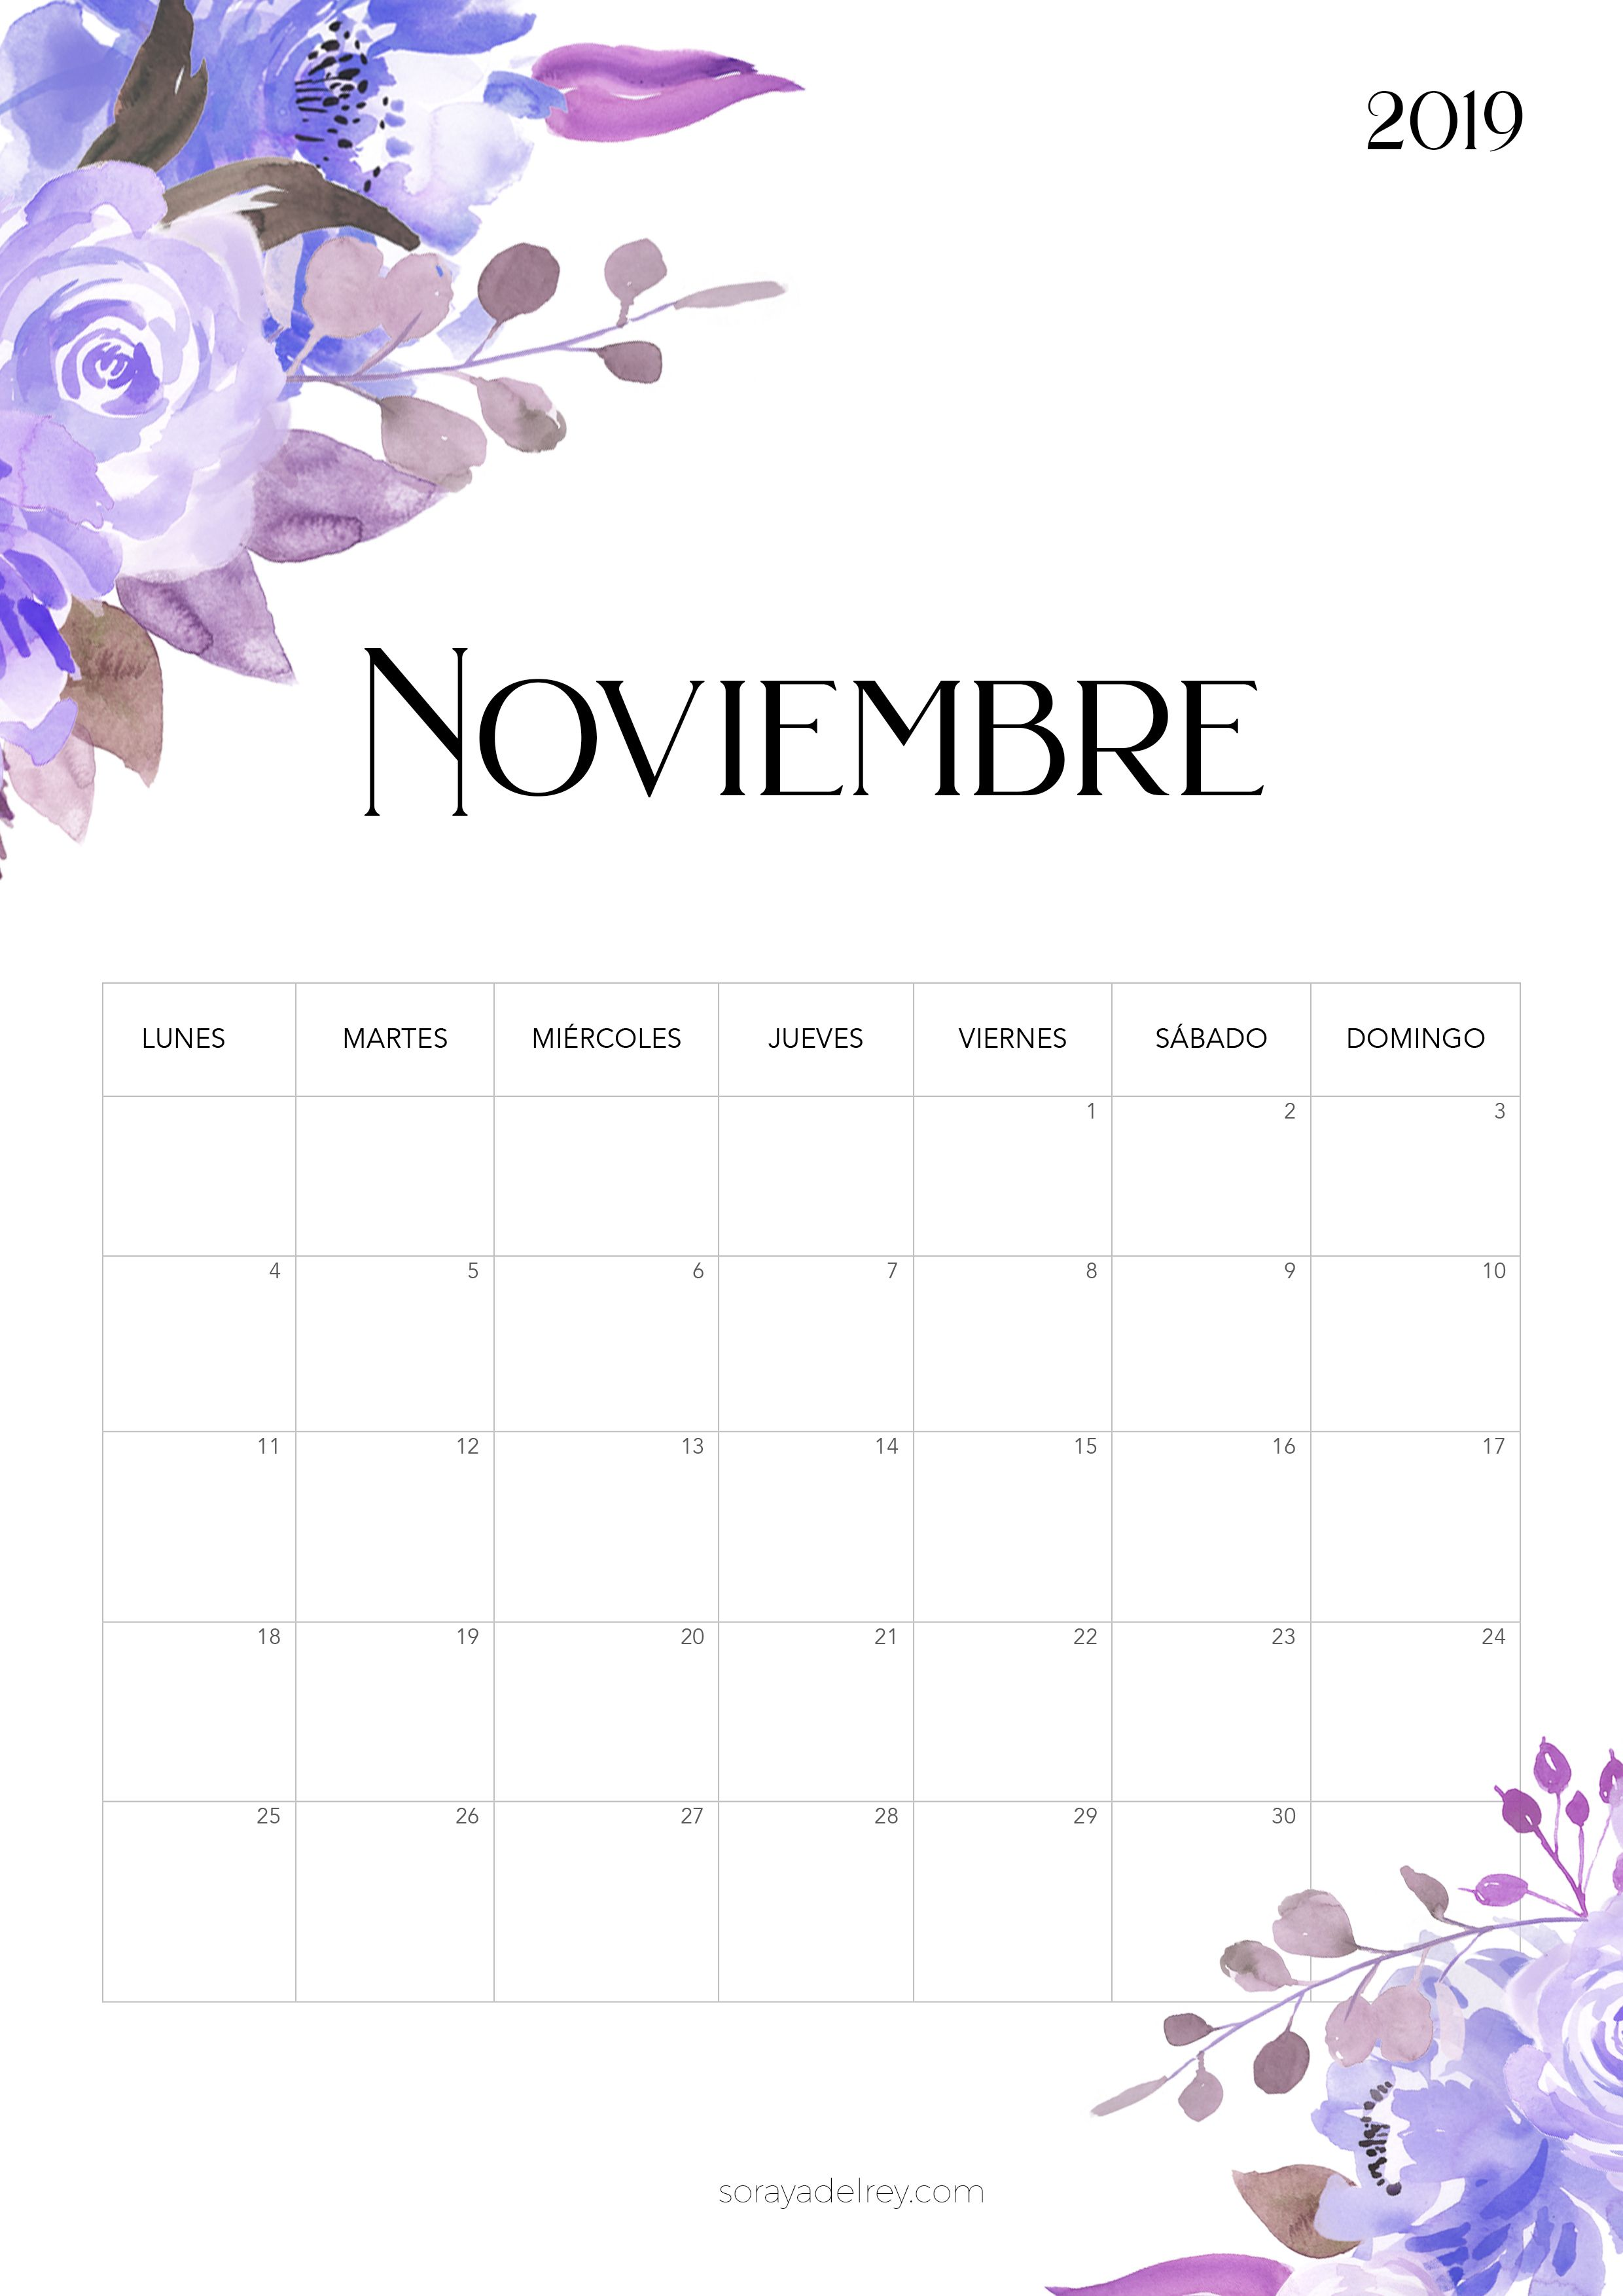 Calendario Noviembre 2019.Calendario Para Imprimir 2018 2019 Stranichki Dlya Bloknotov